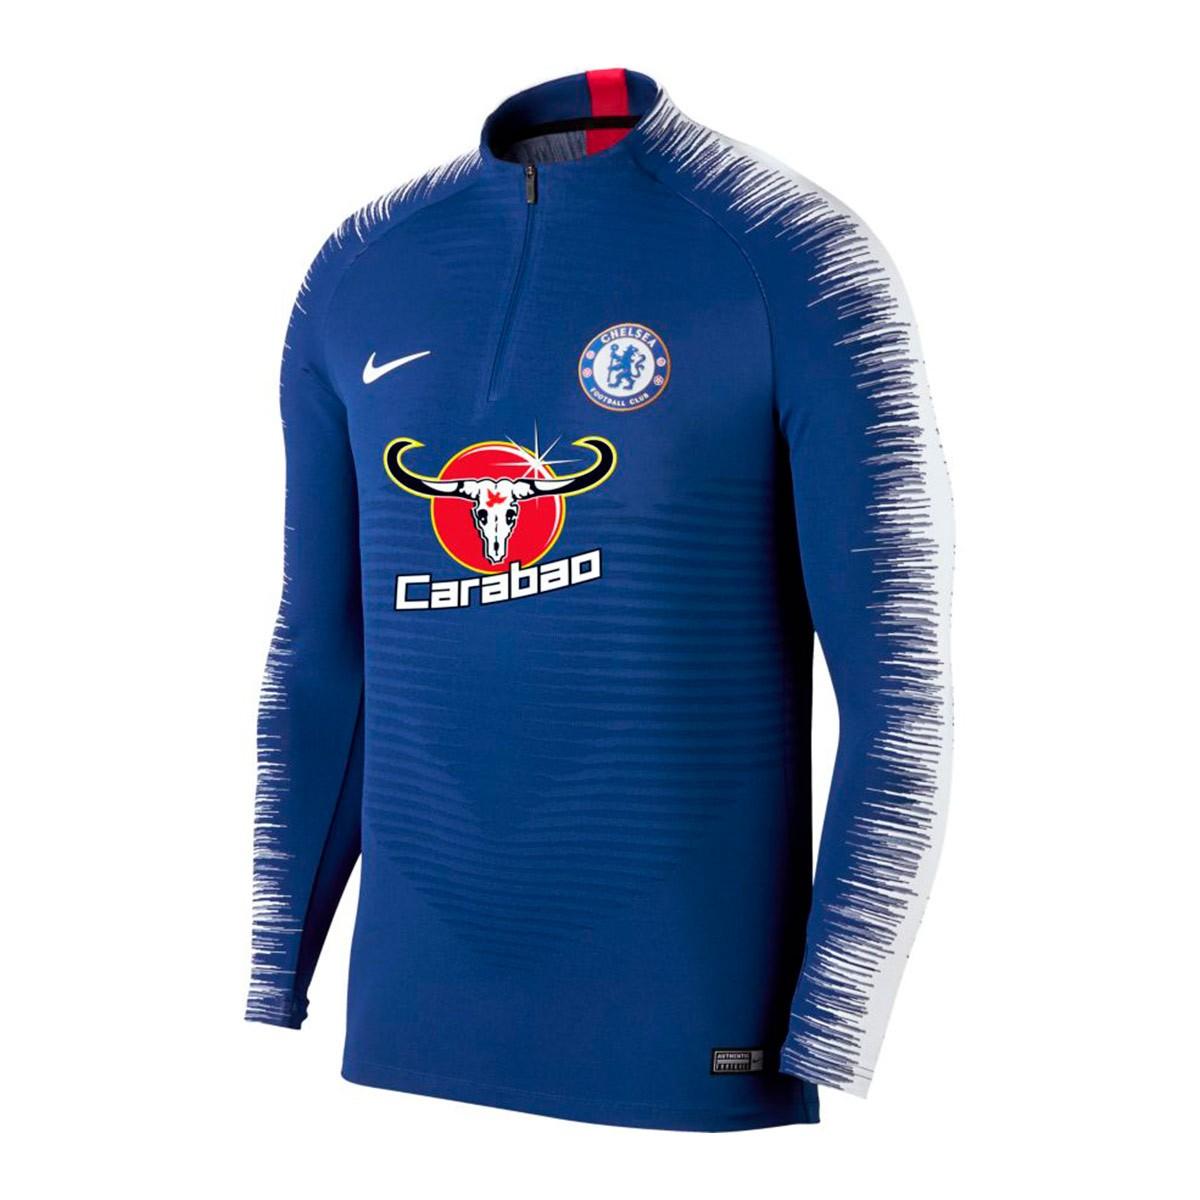 010b1a6940 Sweatshirt Nike Chelsea FC VaporKnit Strike 2018-2019 Rush blue ...